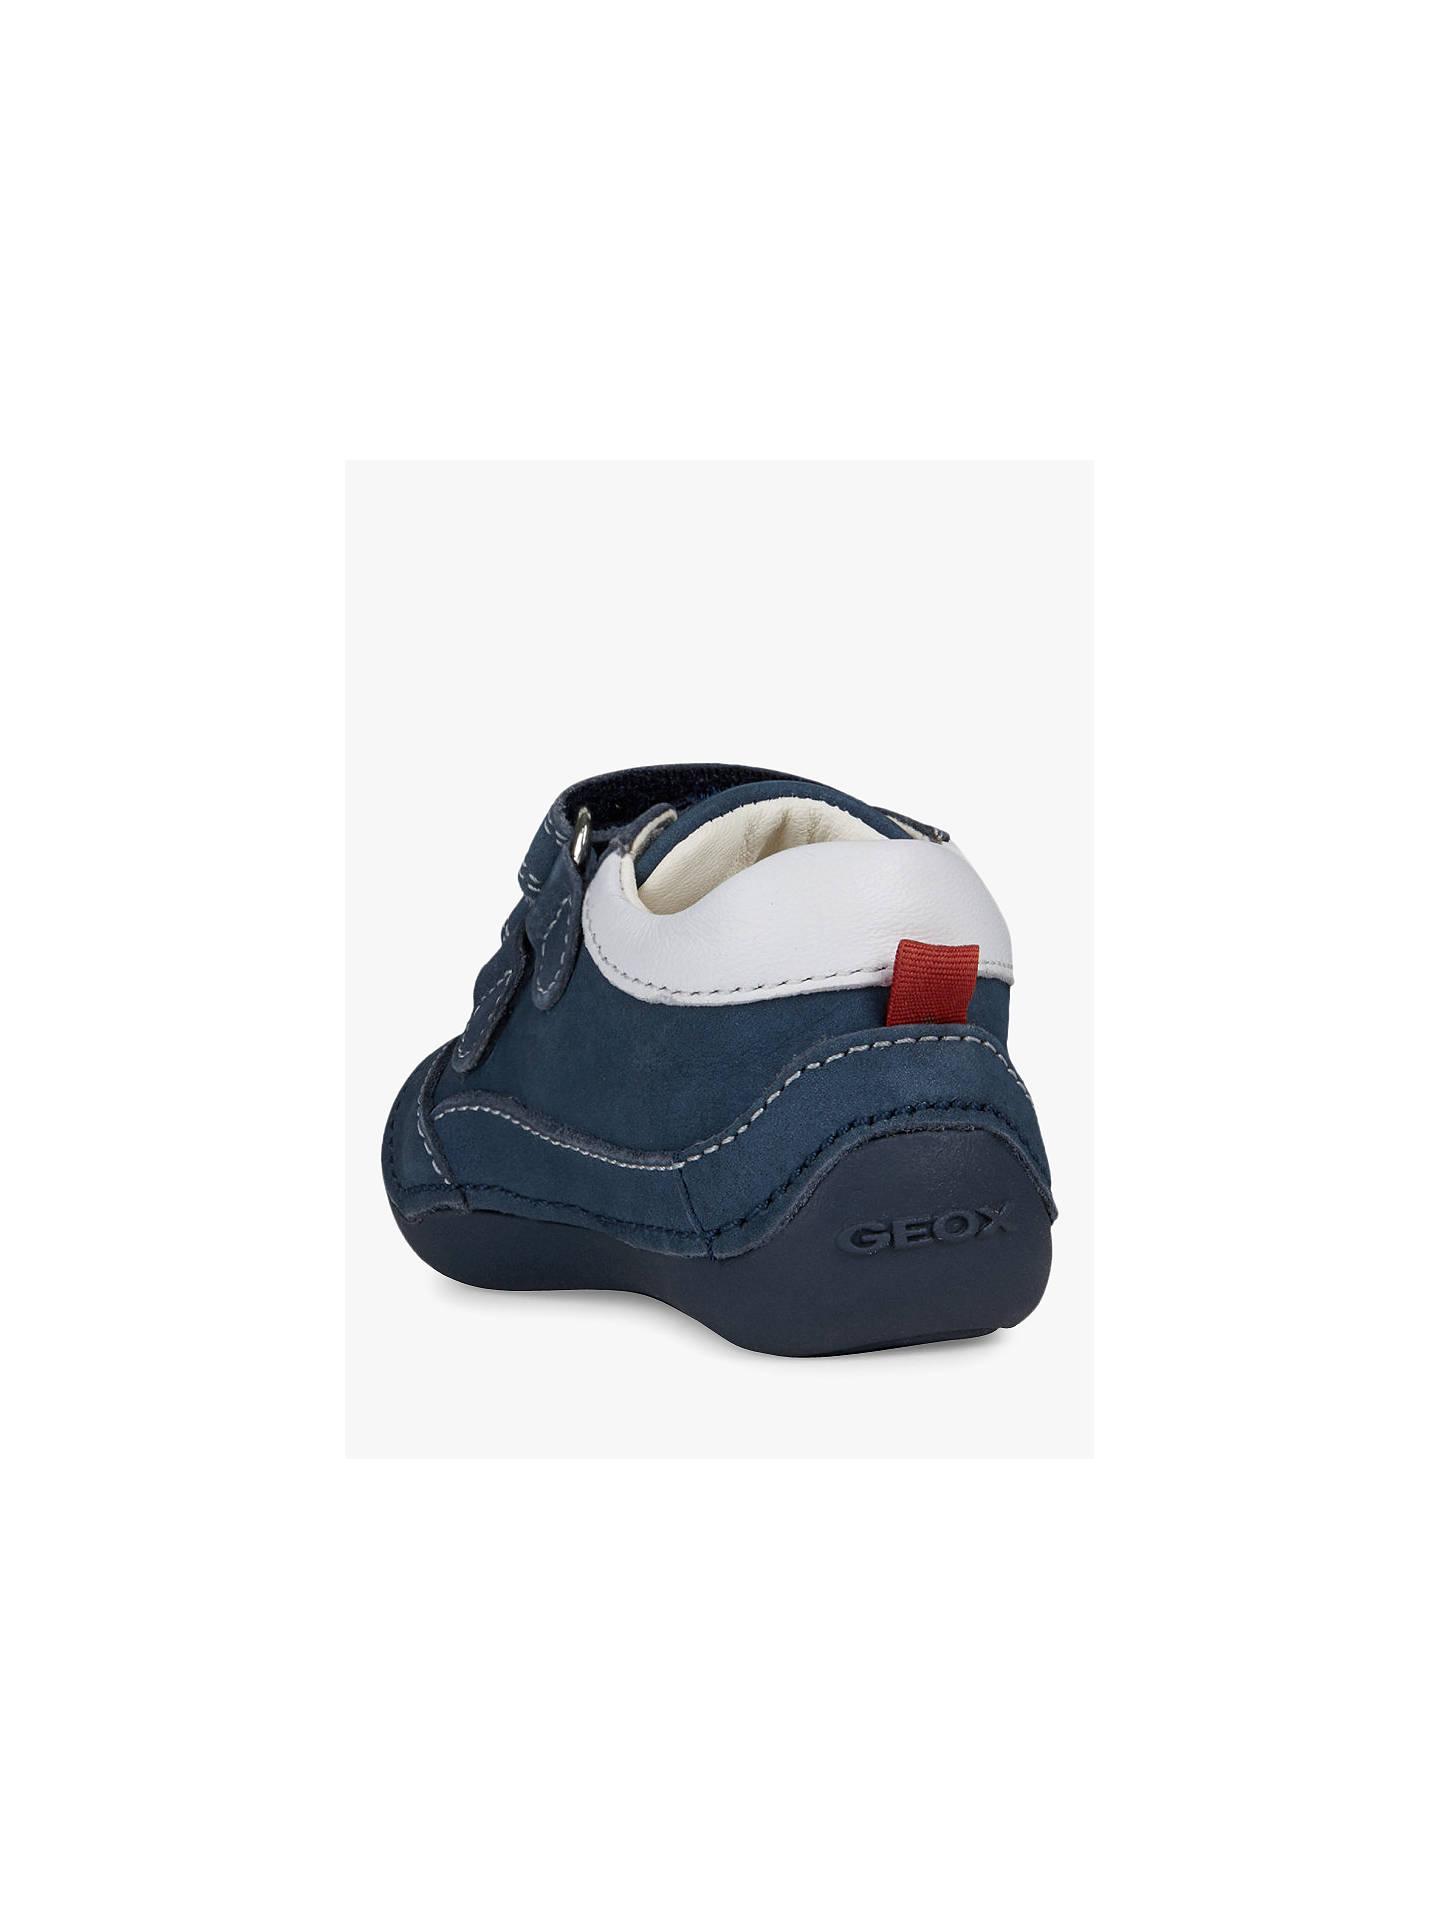 f0fa6e81f9 ... Buy Geox Children's Tutim B Riptape Shoes, Navy/White, 19 Online at  johnlewis ...